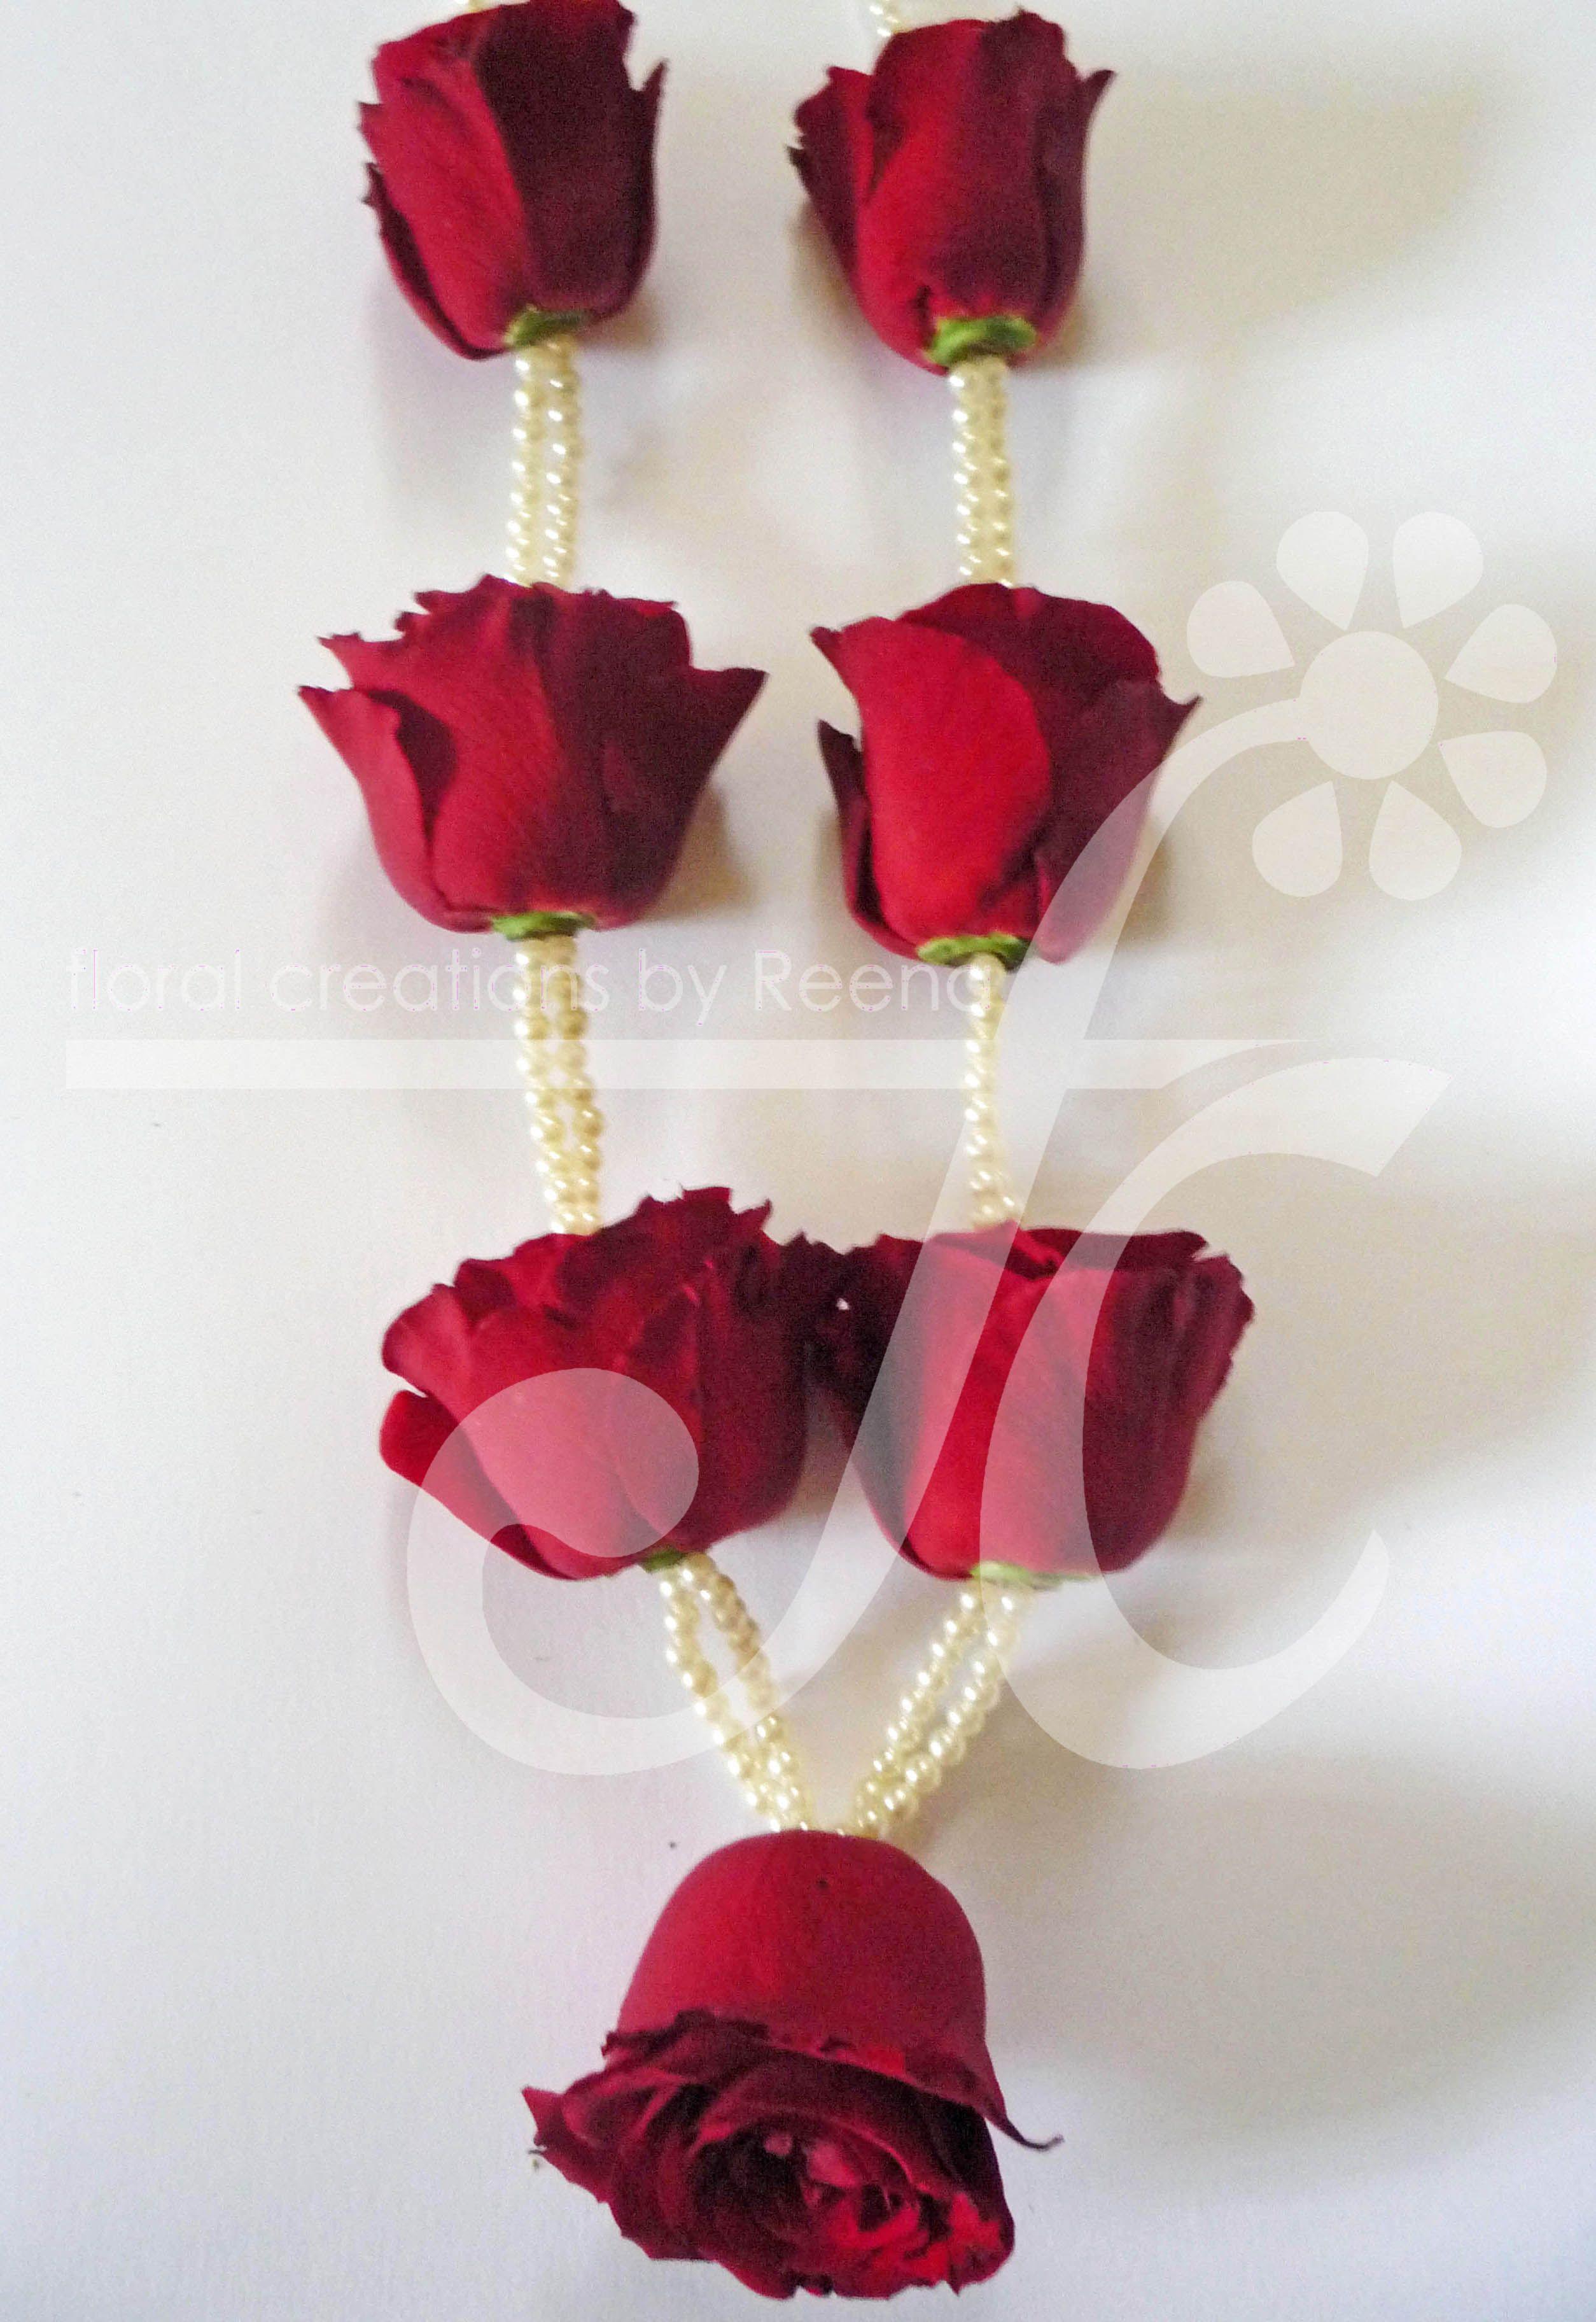 Freedom Rose And Pearls Flower Jewelry Neckless Indian Wedding Garland Garland Wedding Decor Garland Wedding